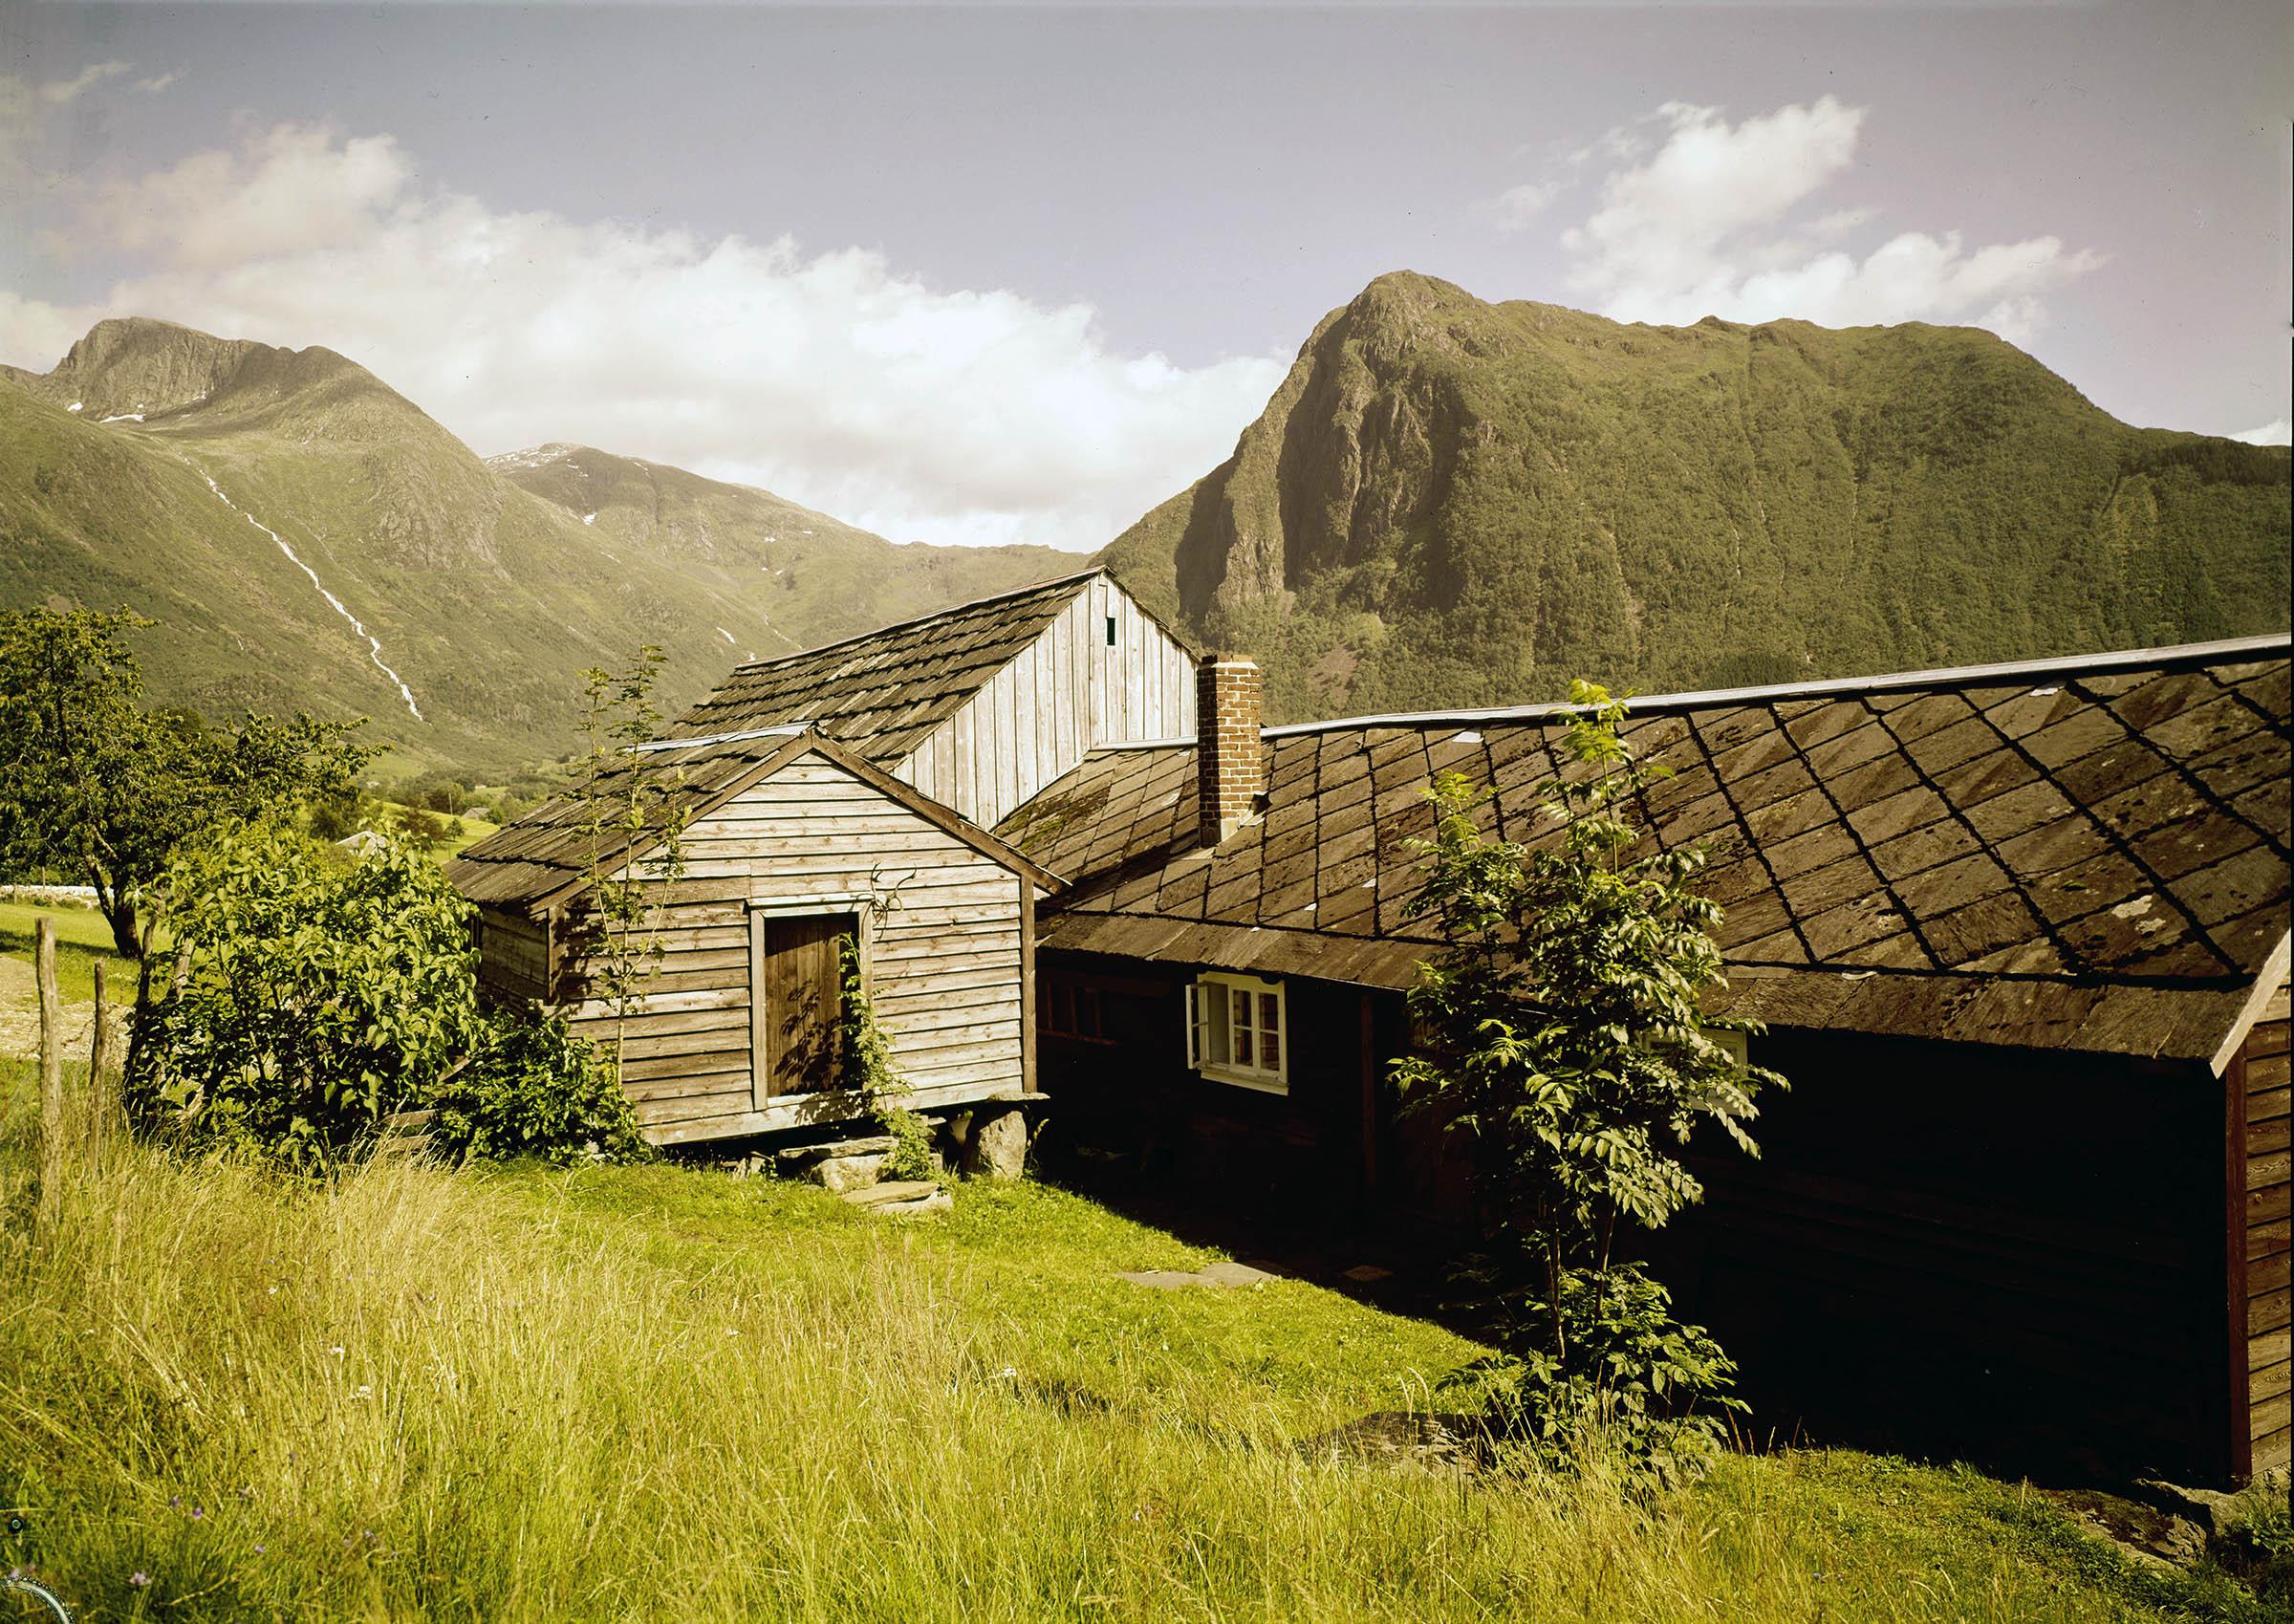 Old bondegård - farm - in Rosendal, Kvinnherad, Hordaland, Norway. | Photo: Normanns kunstforlag cc pdm.